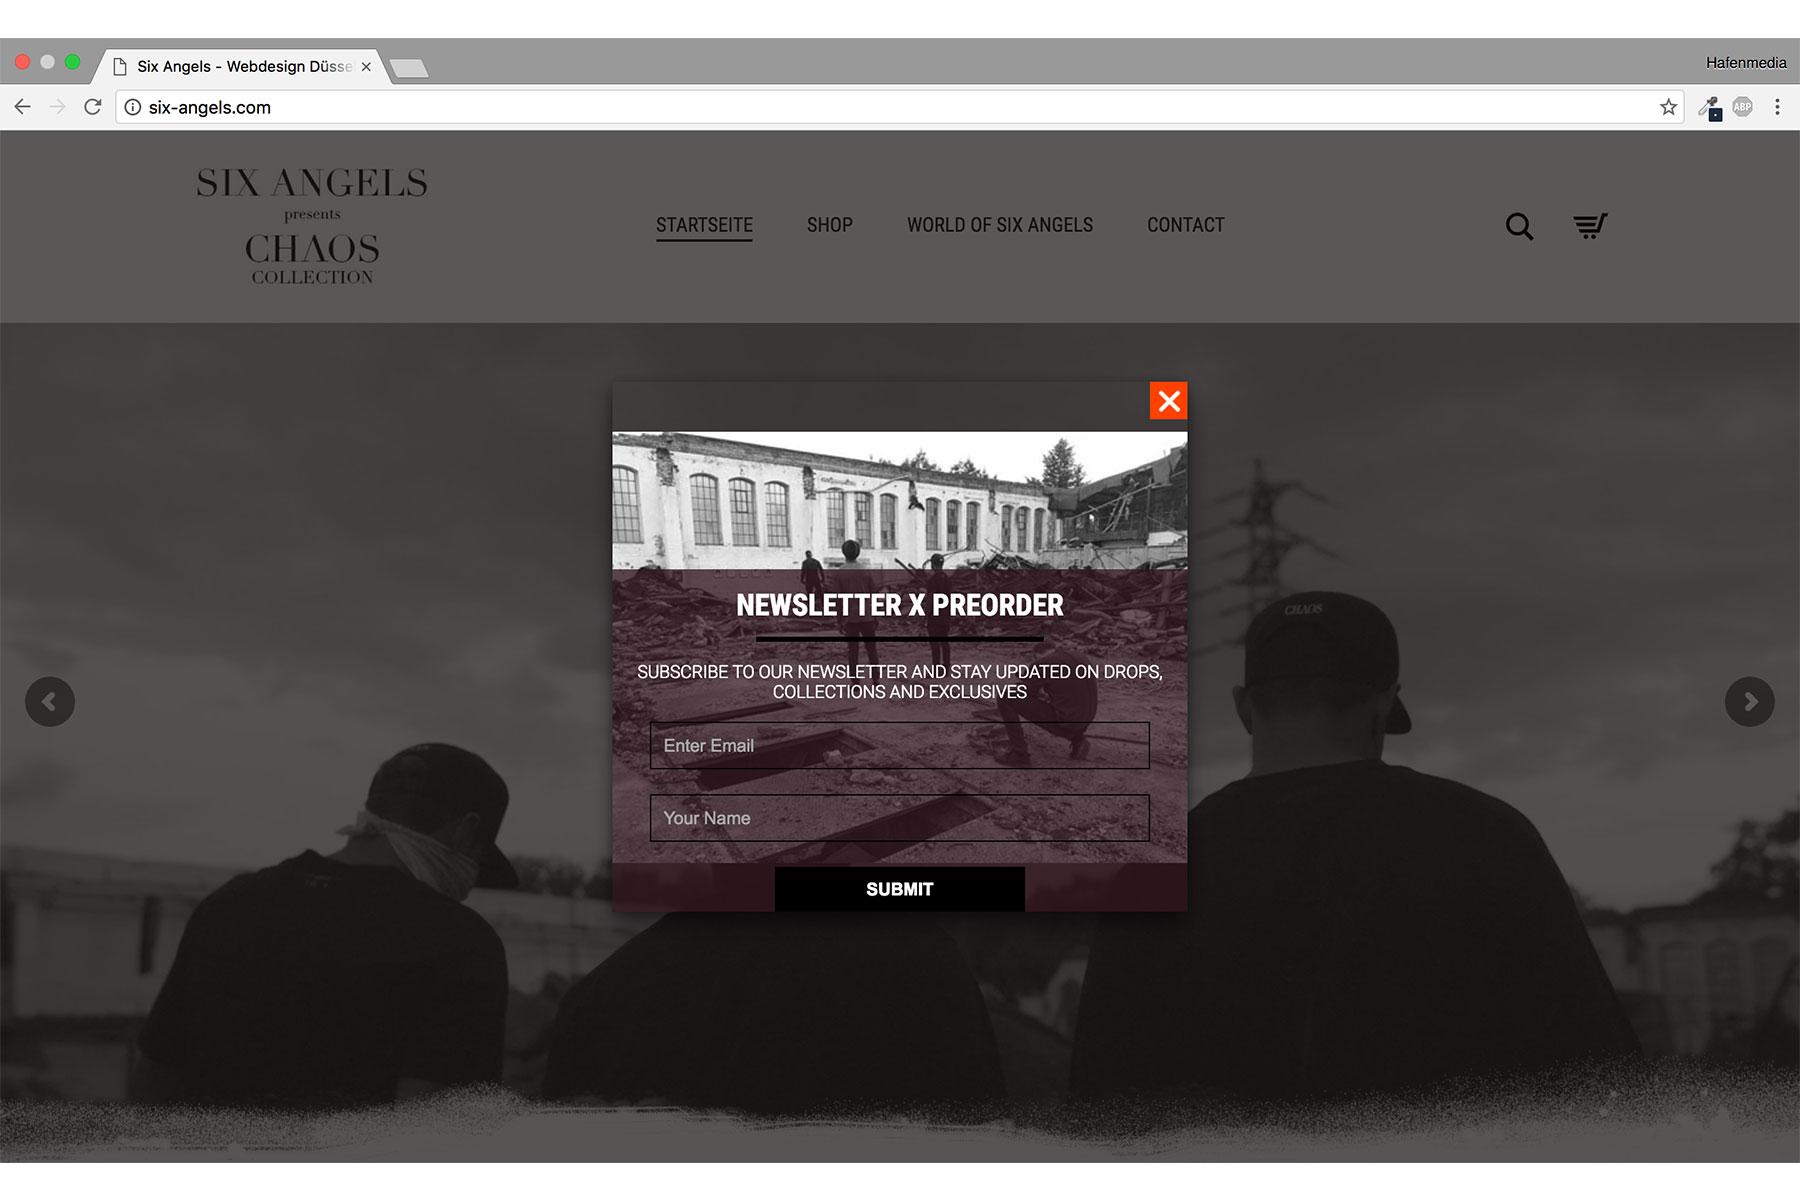 webdesign-duesseldorf-hafenmedia-six-angels-porfolio5